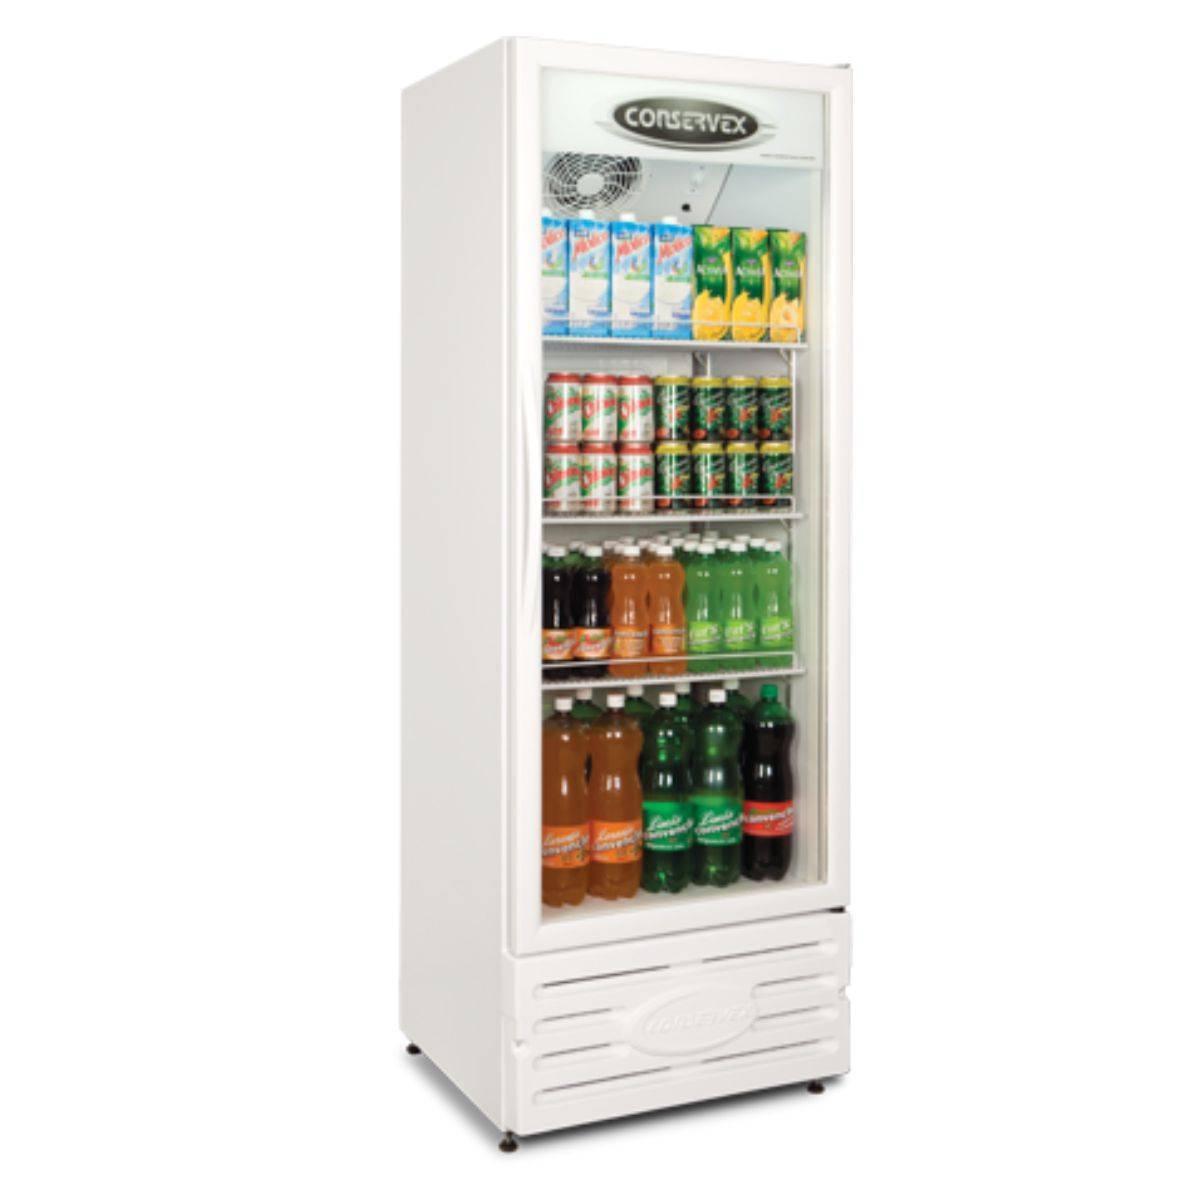 Expositor Refrigerado Vertical Visa Cooler 400L ERV-400 Cons